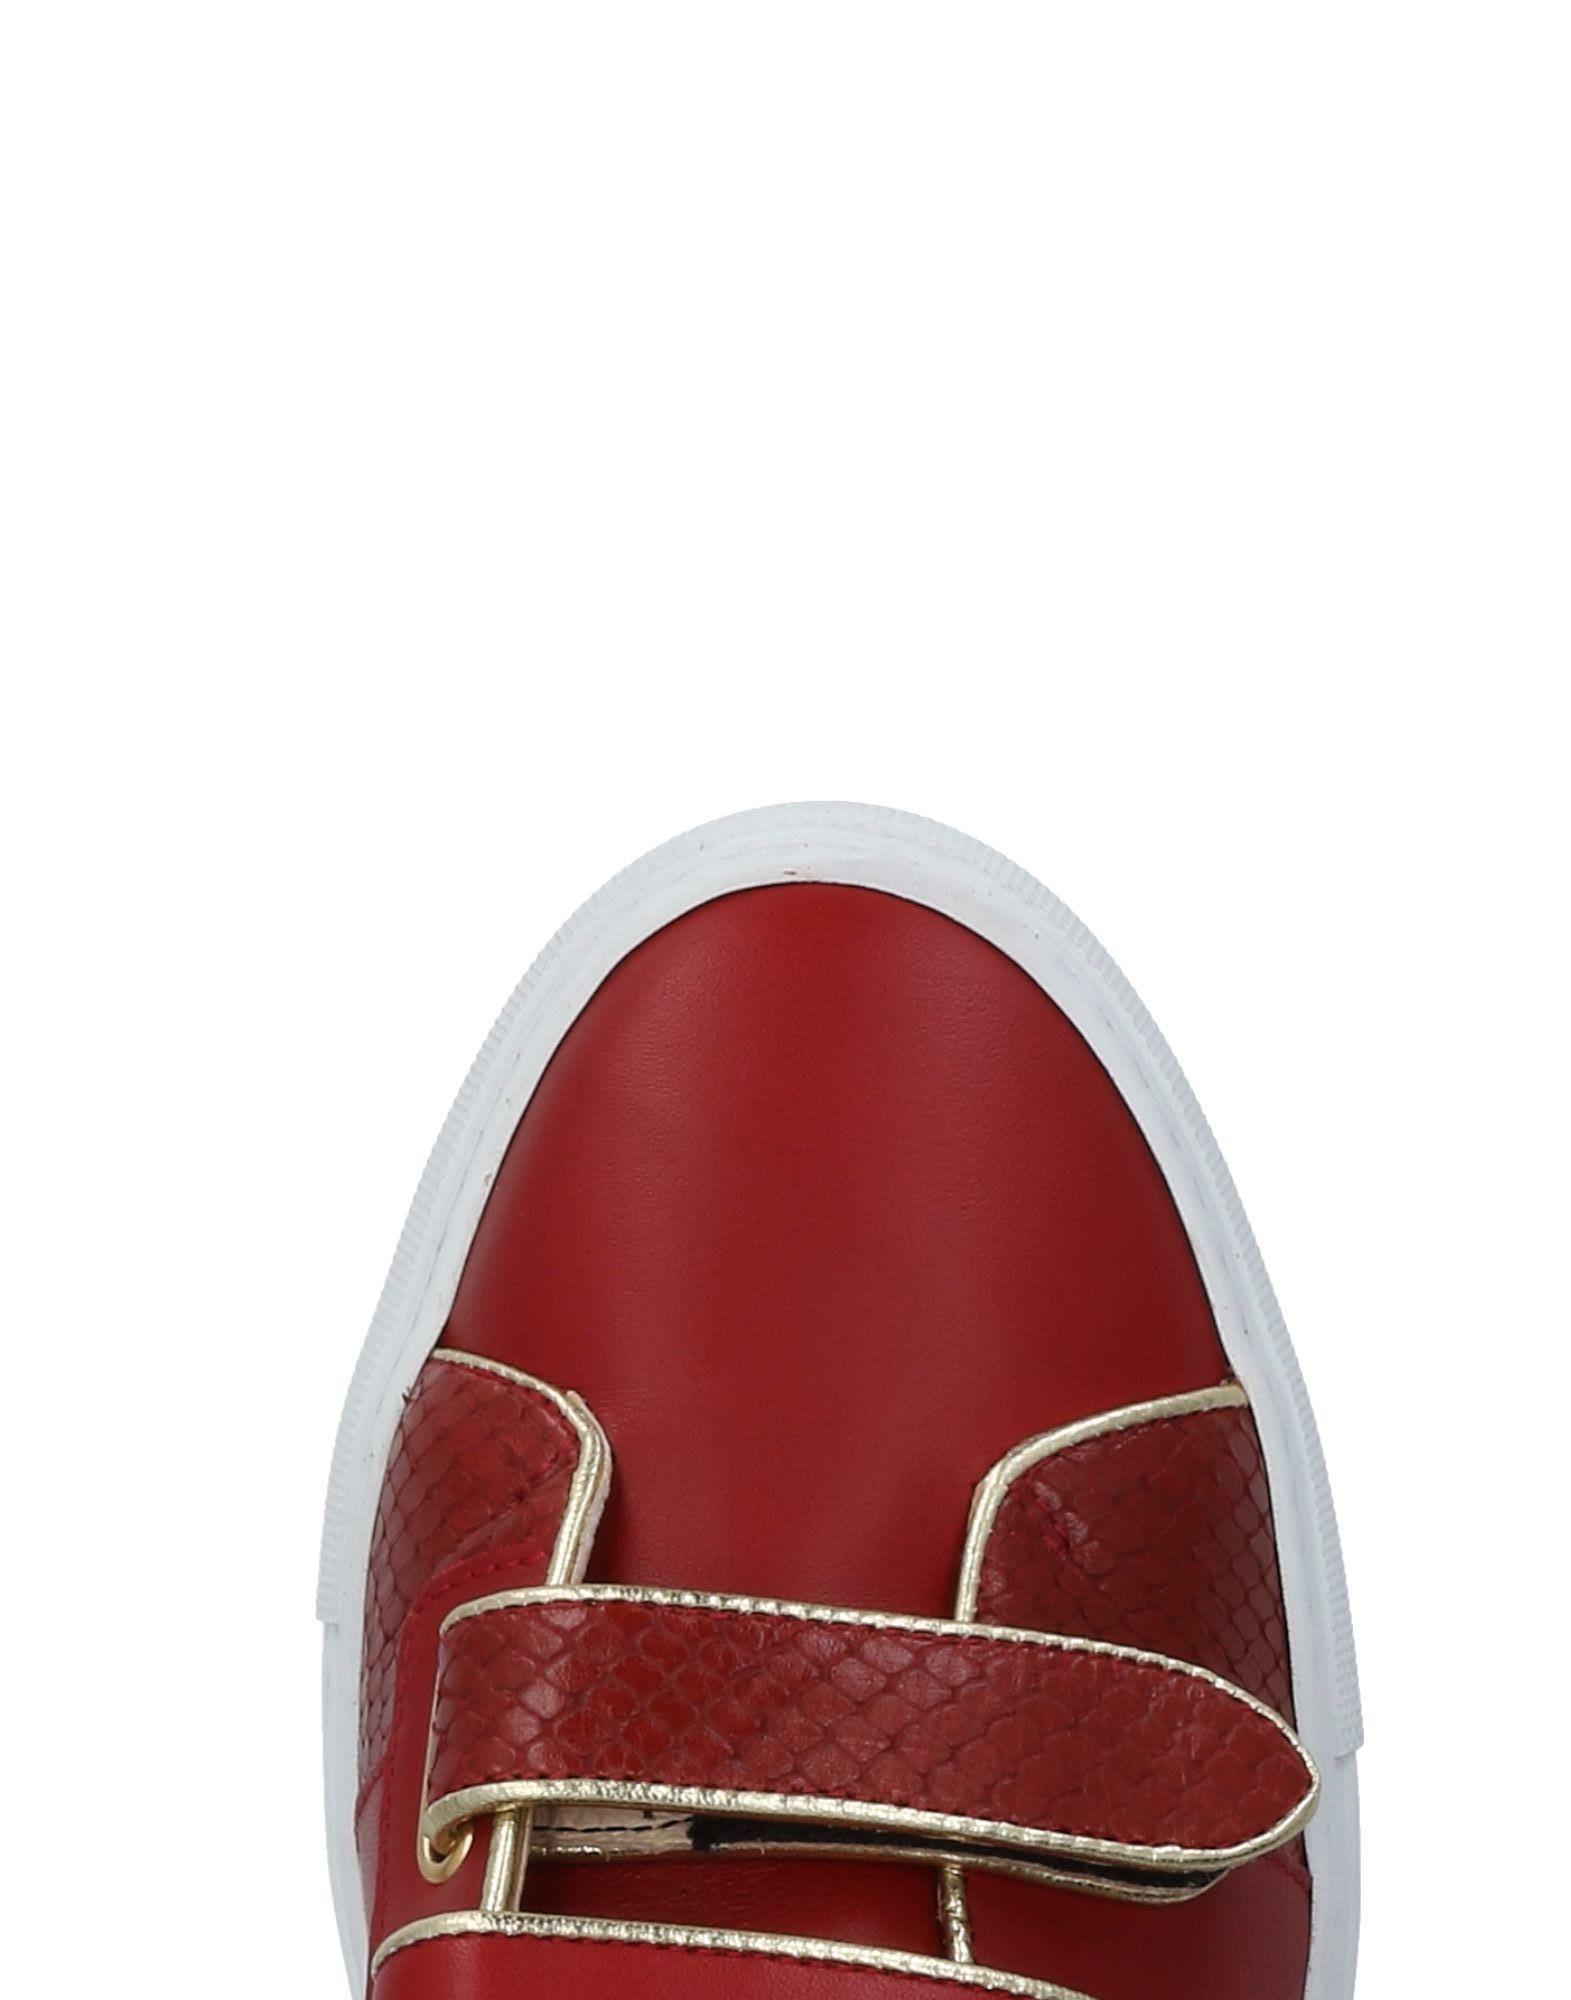 Just Cavalli Sneakers Herren beliebte  11473063HM Gute Qualität beliebte Herren Schuhe dd3a7a